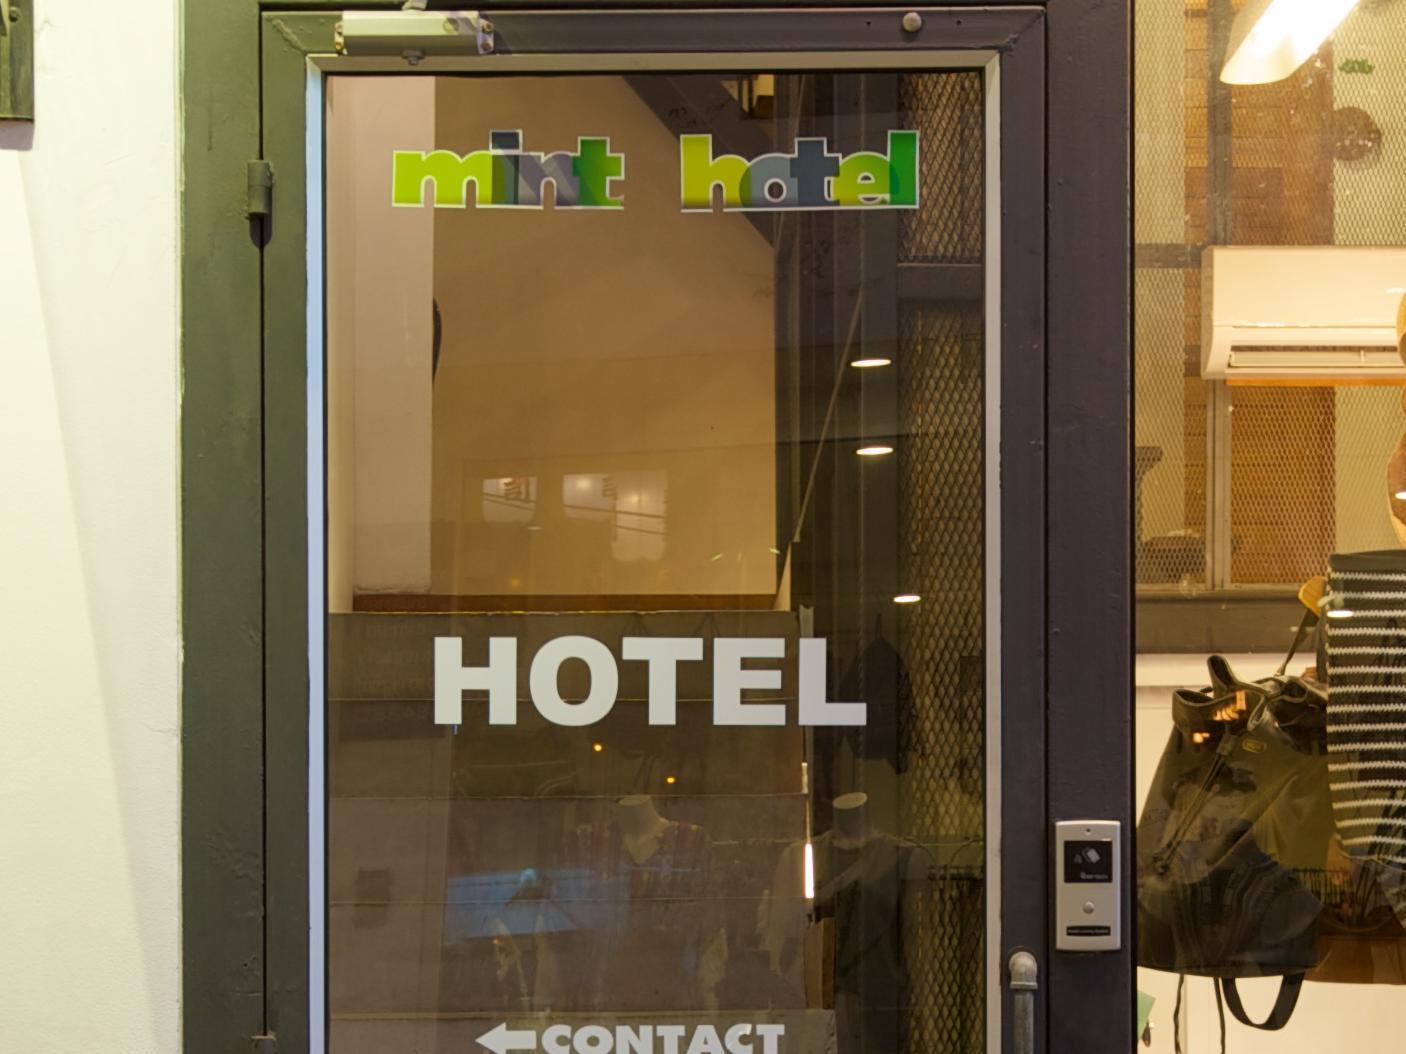 Mint Hotel โรงแรมมินต์